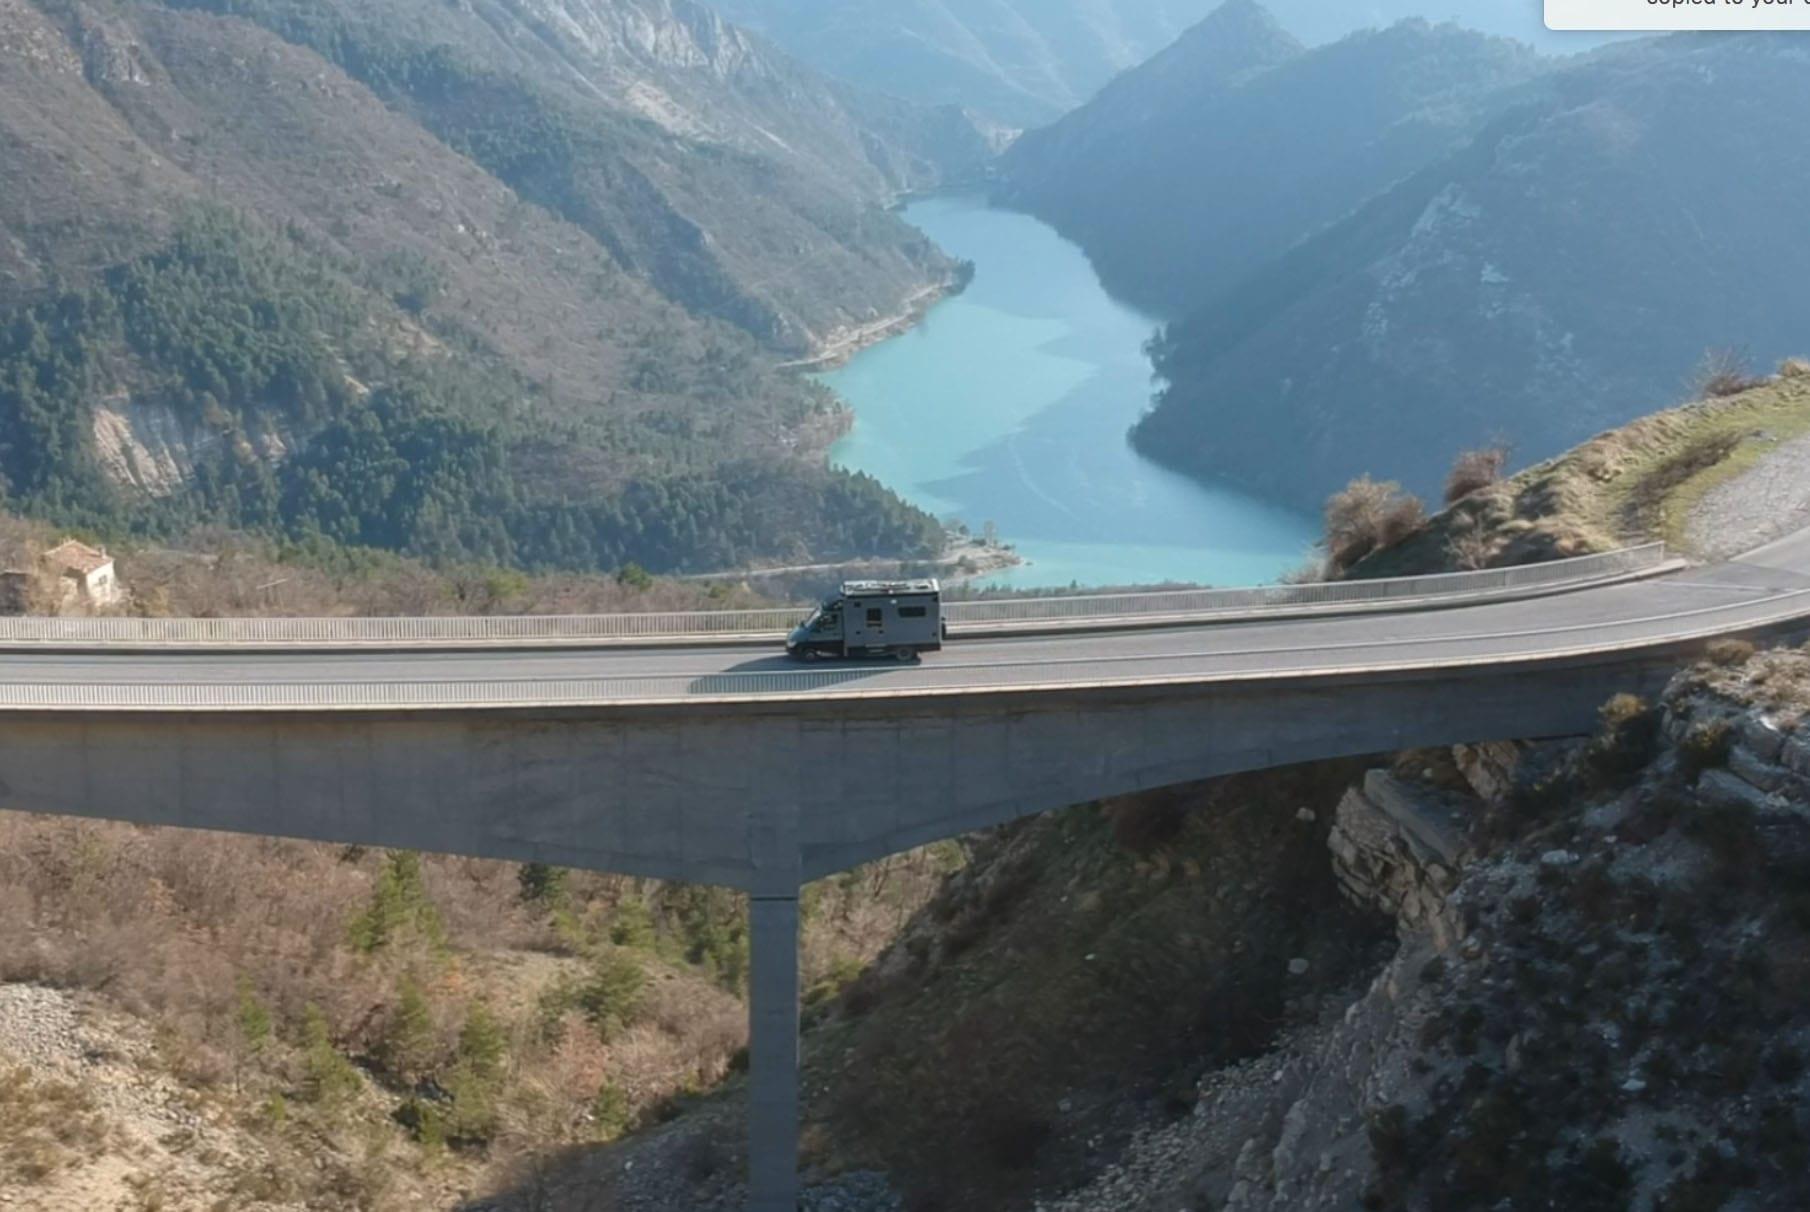 Mercedes-Benz-Sprinter-Ambulanz- Aufbau-vanlife-van-conversion-kaufen-bridge-at-verdon-min